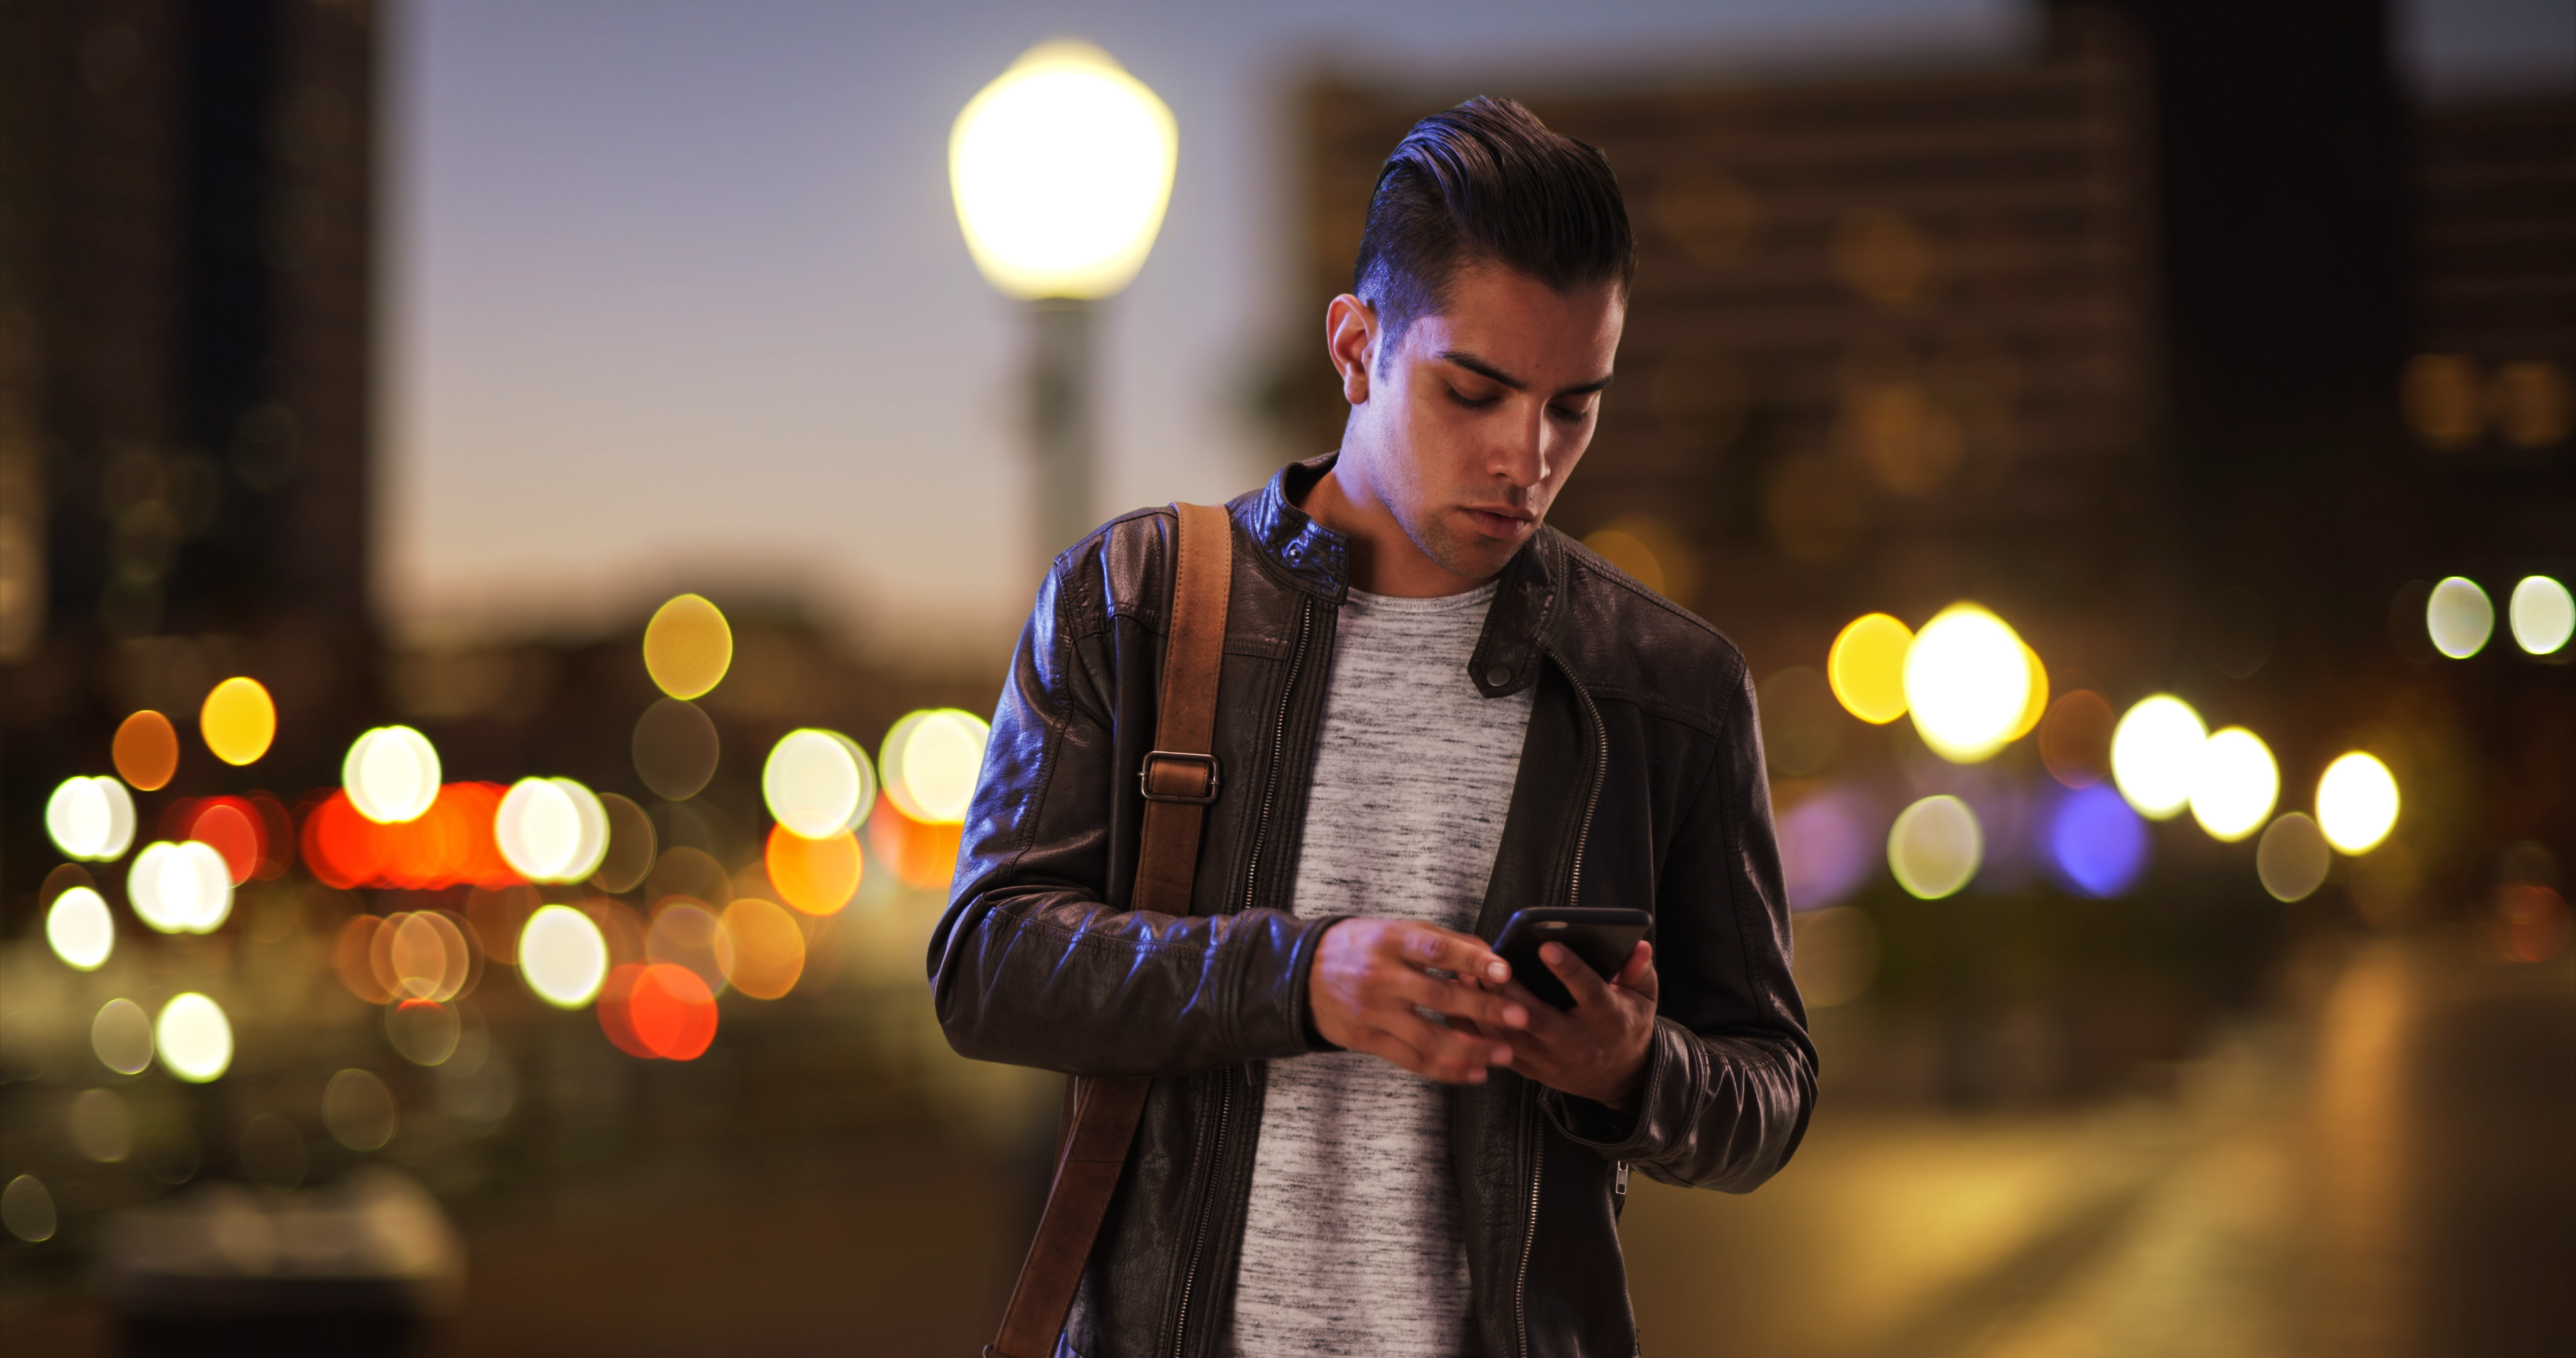 Smartphone, Texting, Millennial